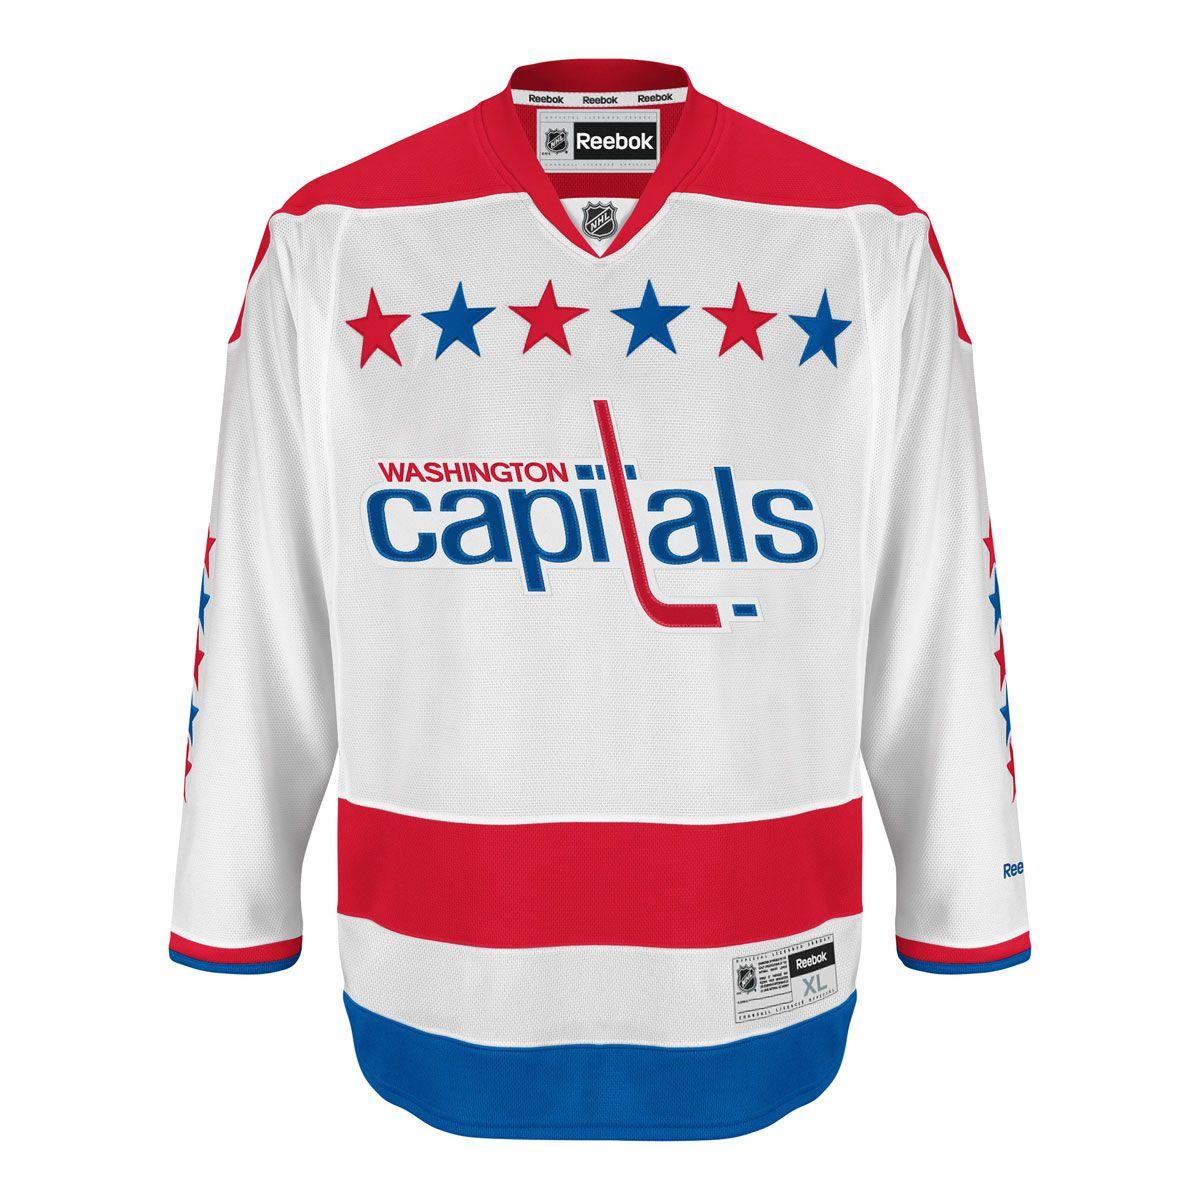 low priced 91580 75ce0 Washington Capitals Reebok Premier Replica Alternate NHL ...